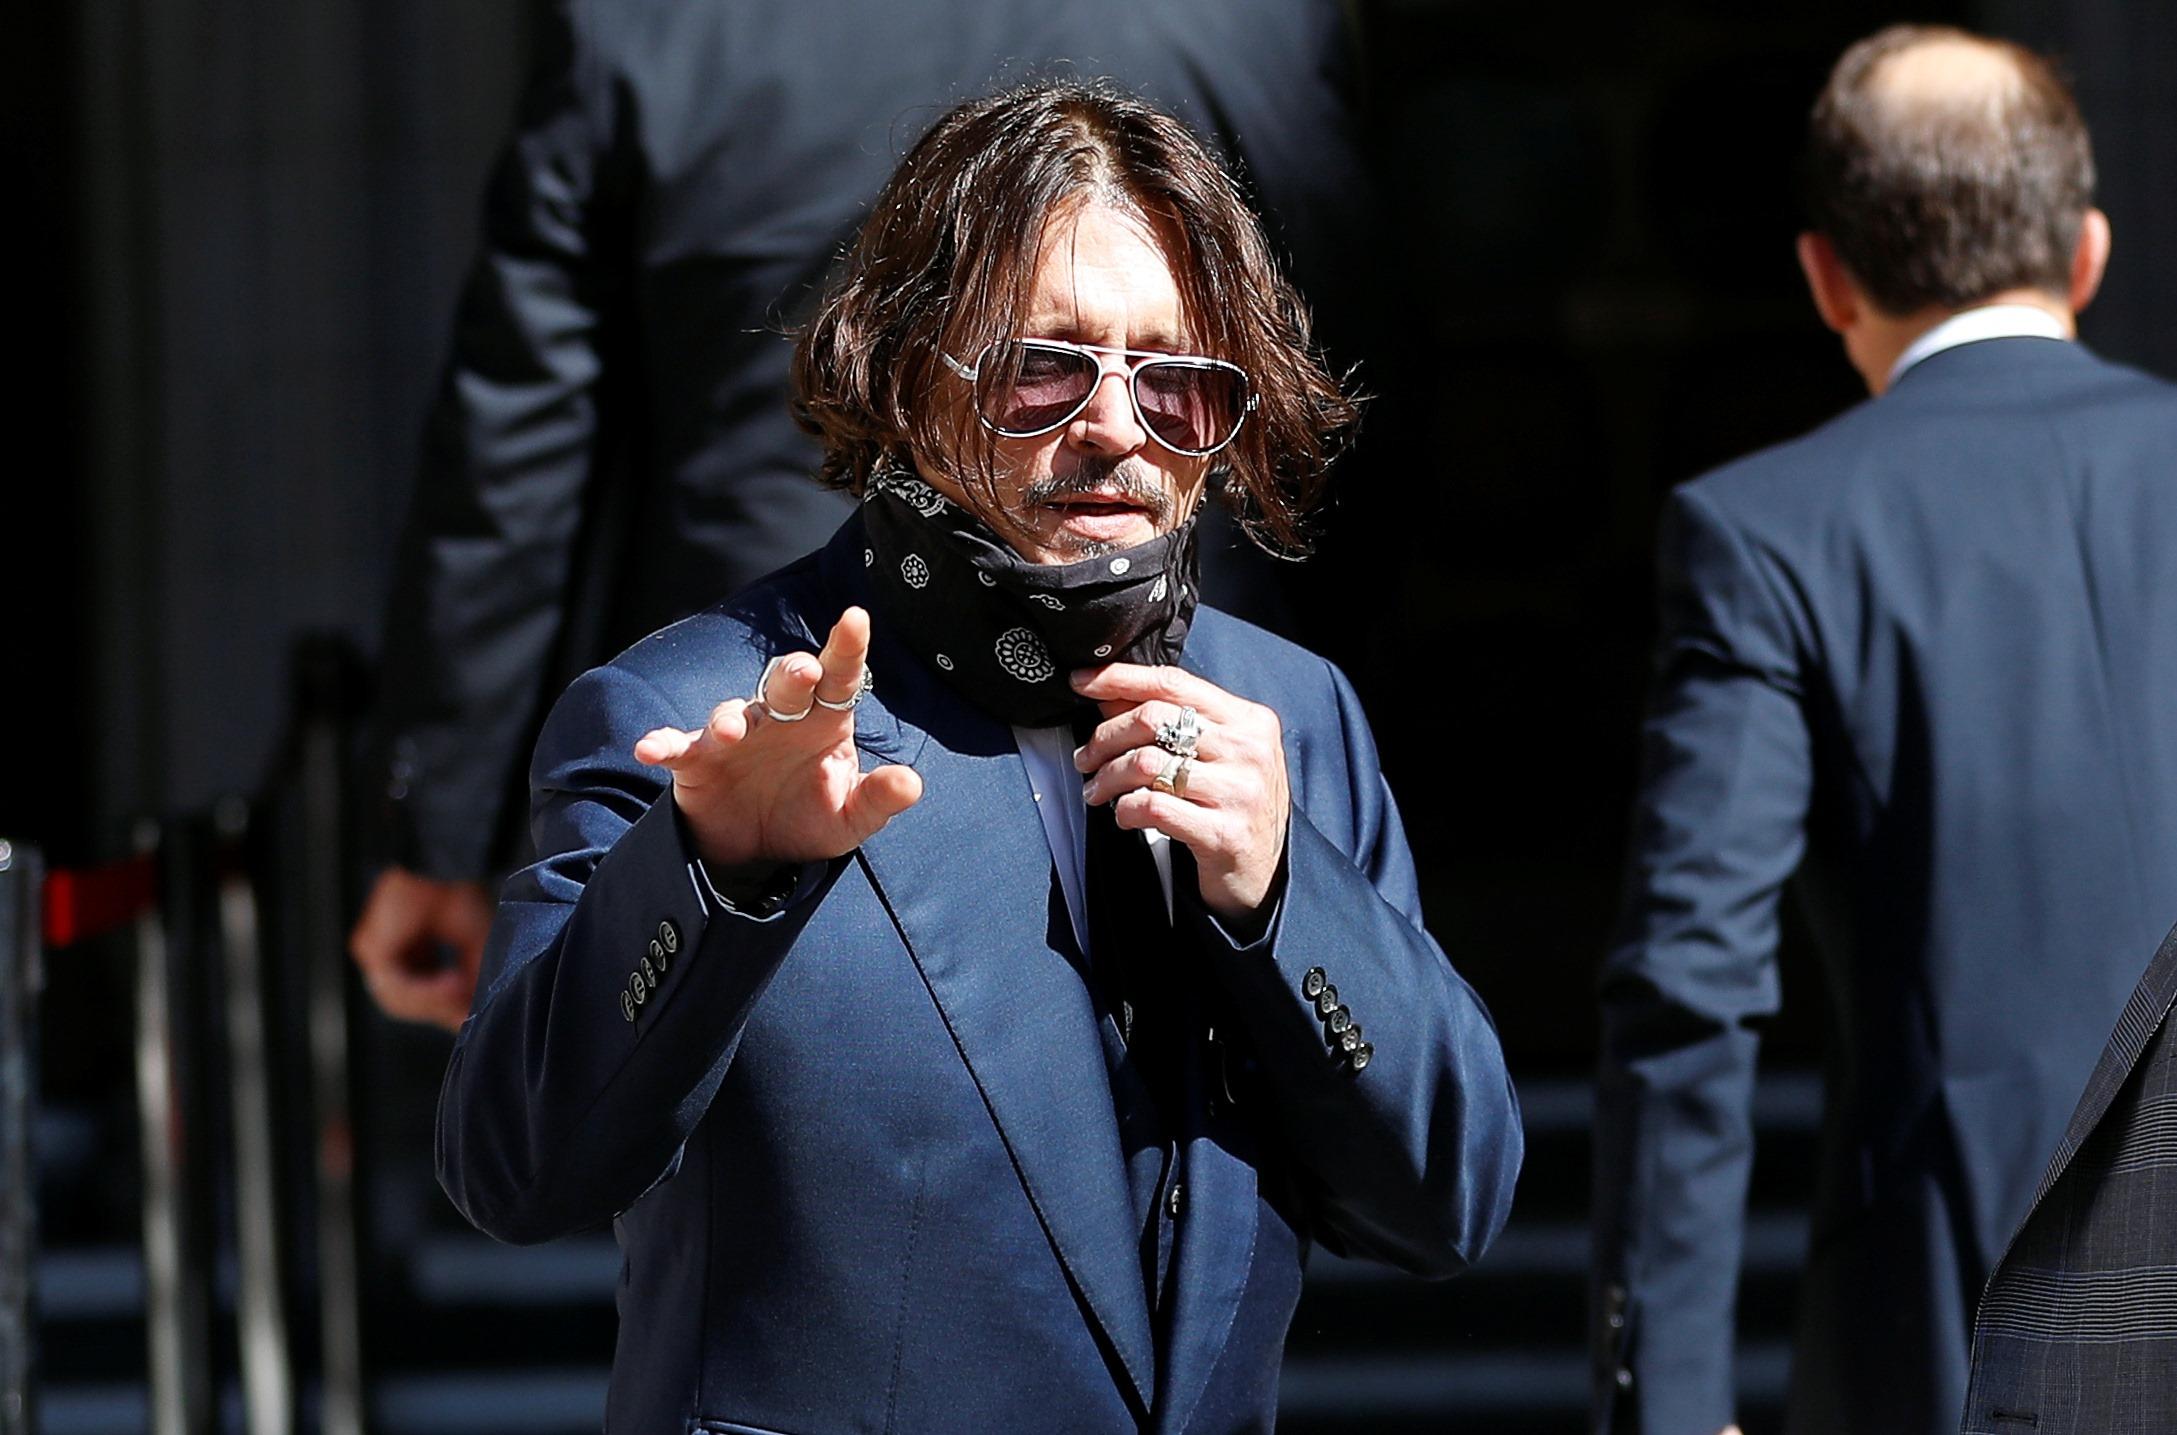 Johnny Depp: Με μάσκα στο δικαστήριο! Η Heard έφθασε με την σύντροφό της! Φωτογραφίες